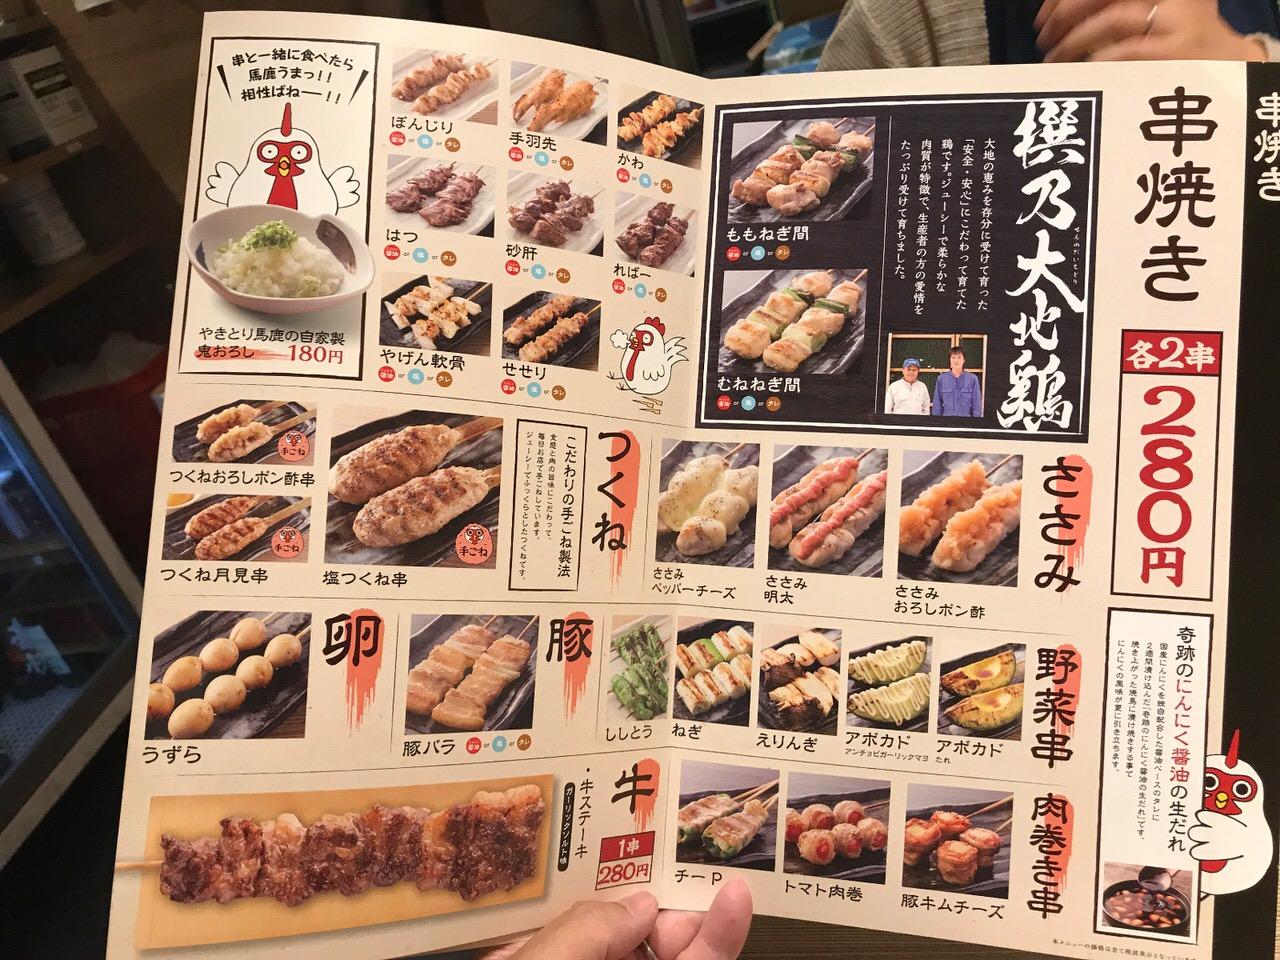 Yakitori center 3852